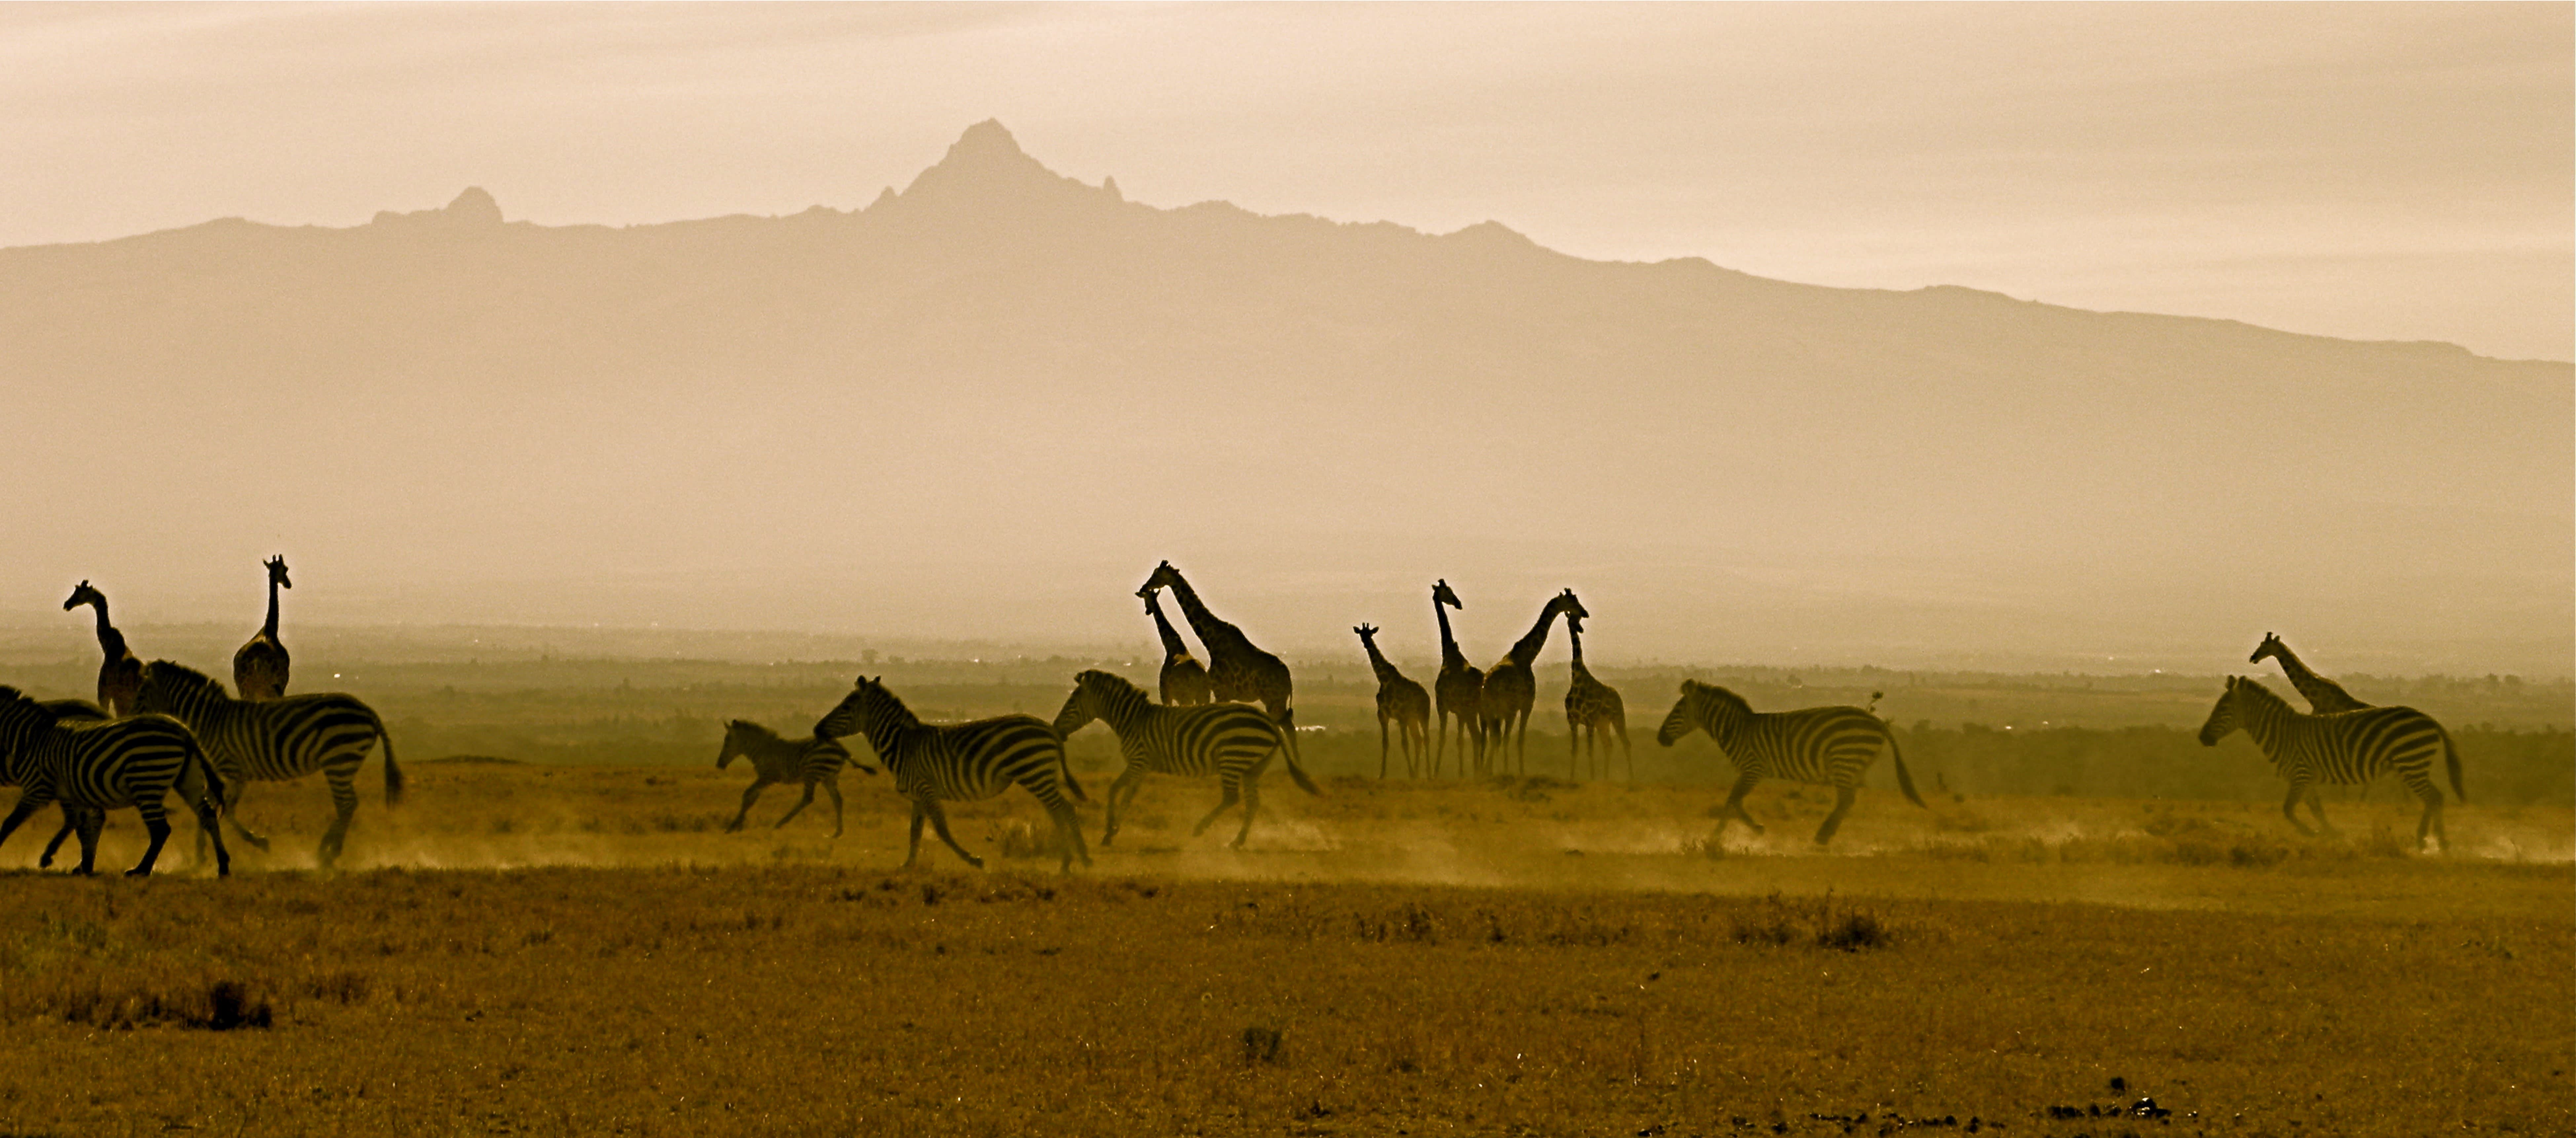 Safri in Kenia, Giraffen